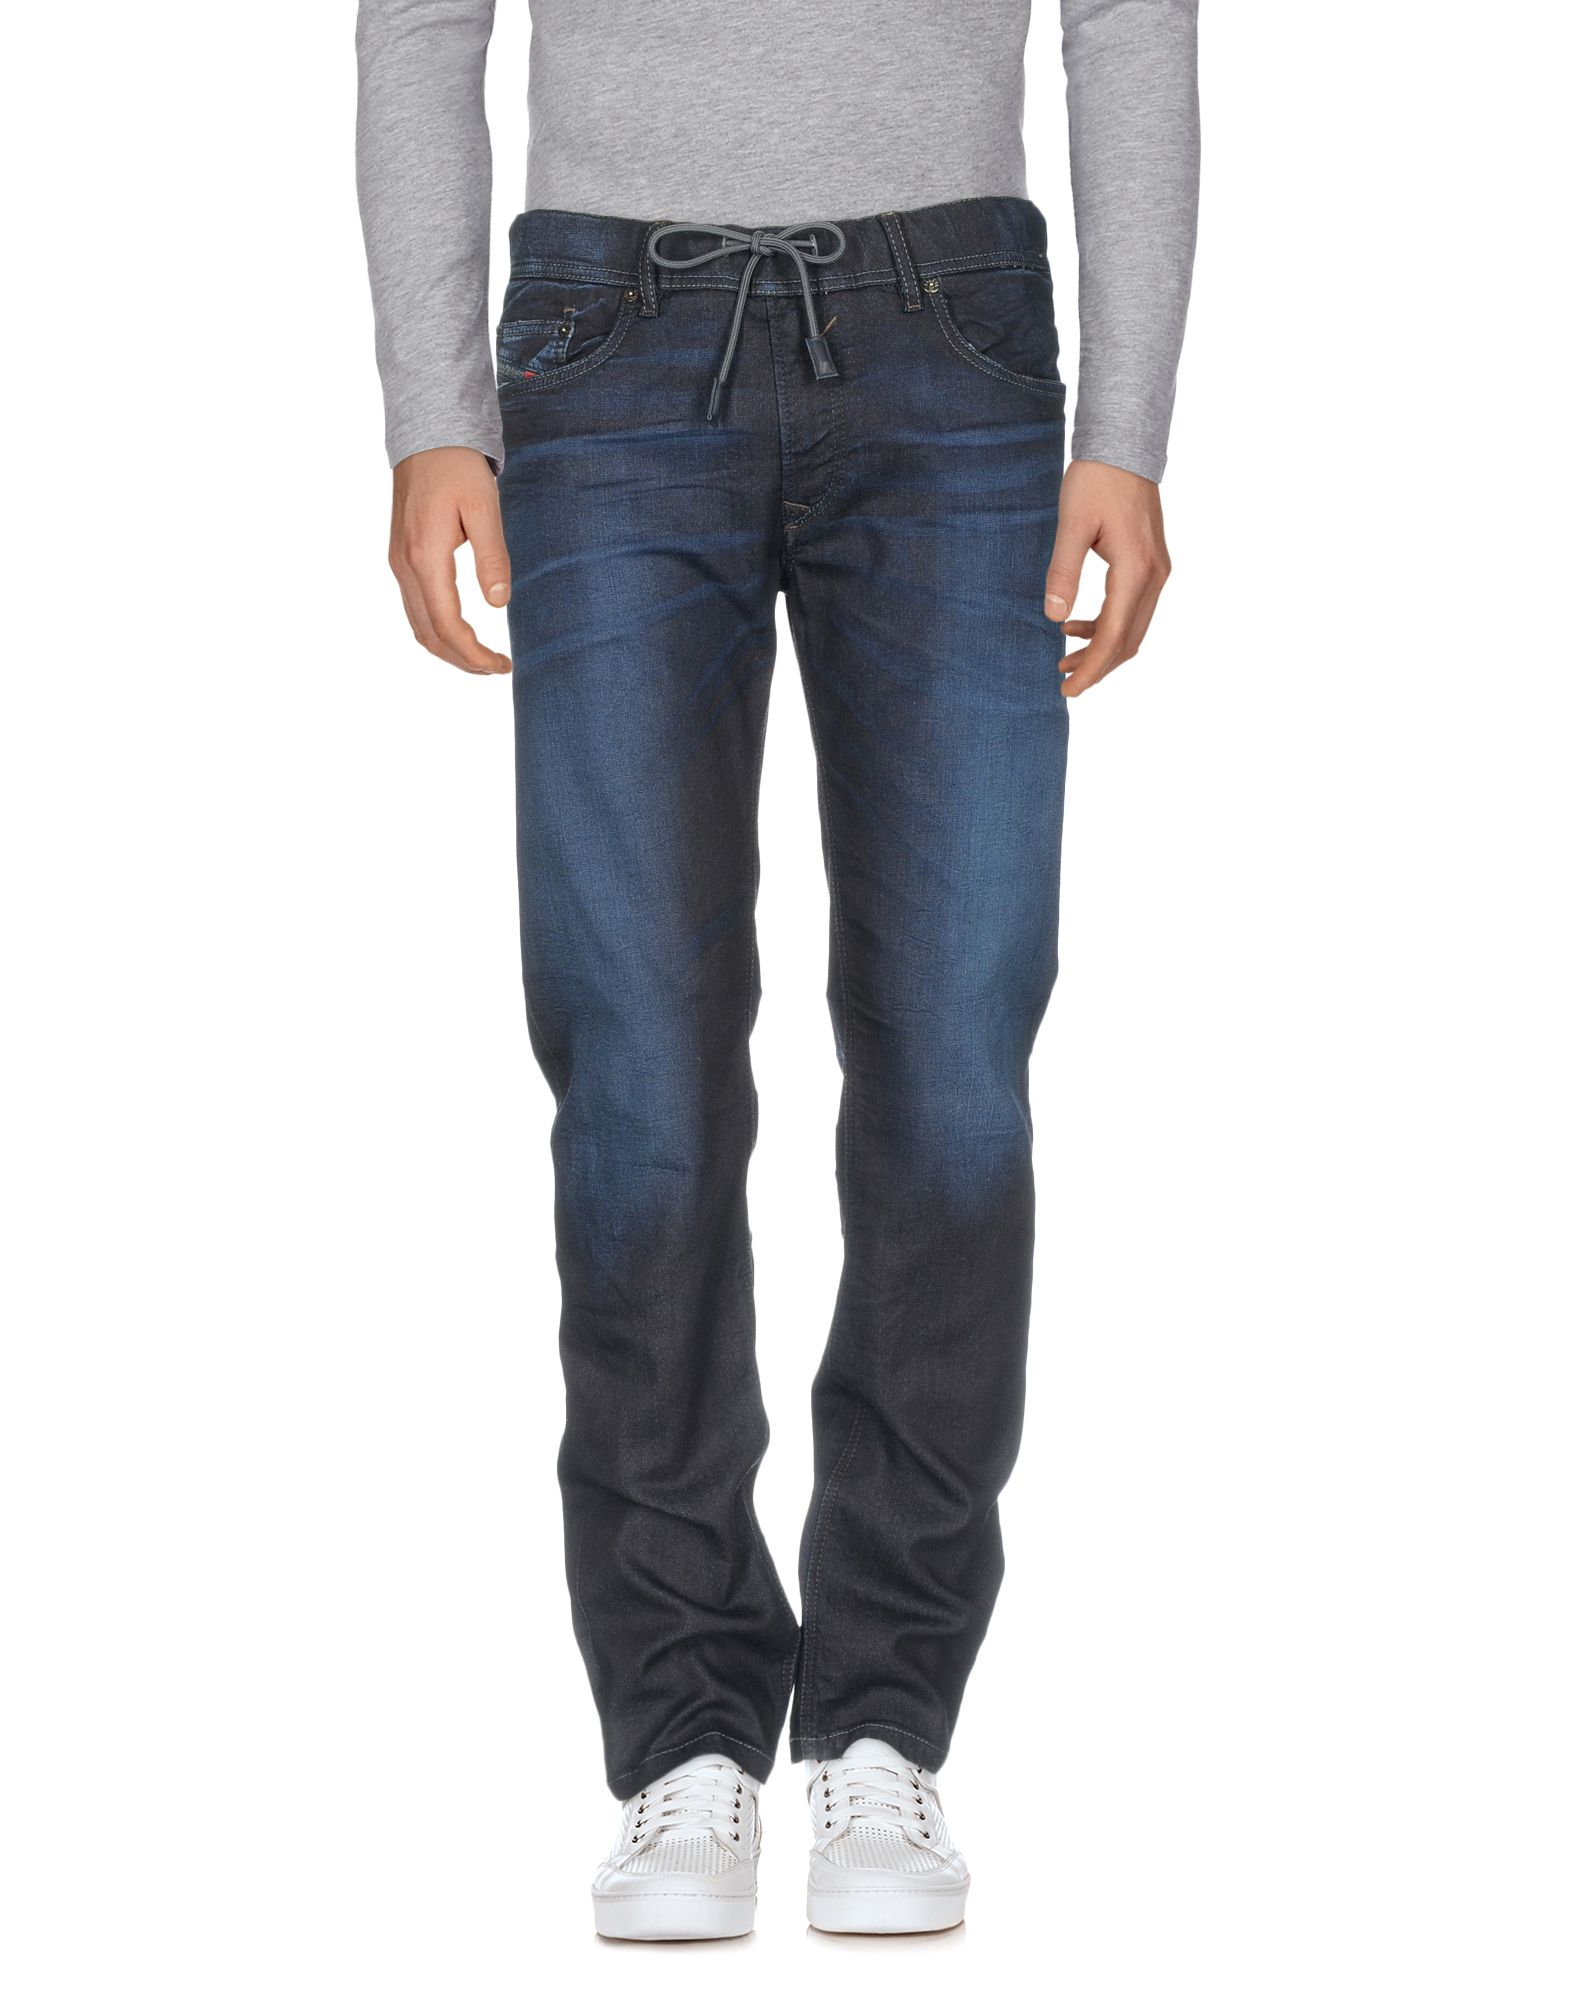 Pantalone Diesel Uomo - Acquista online su